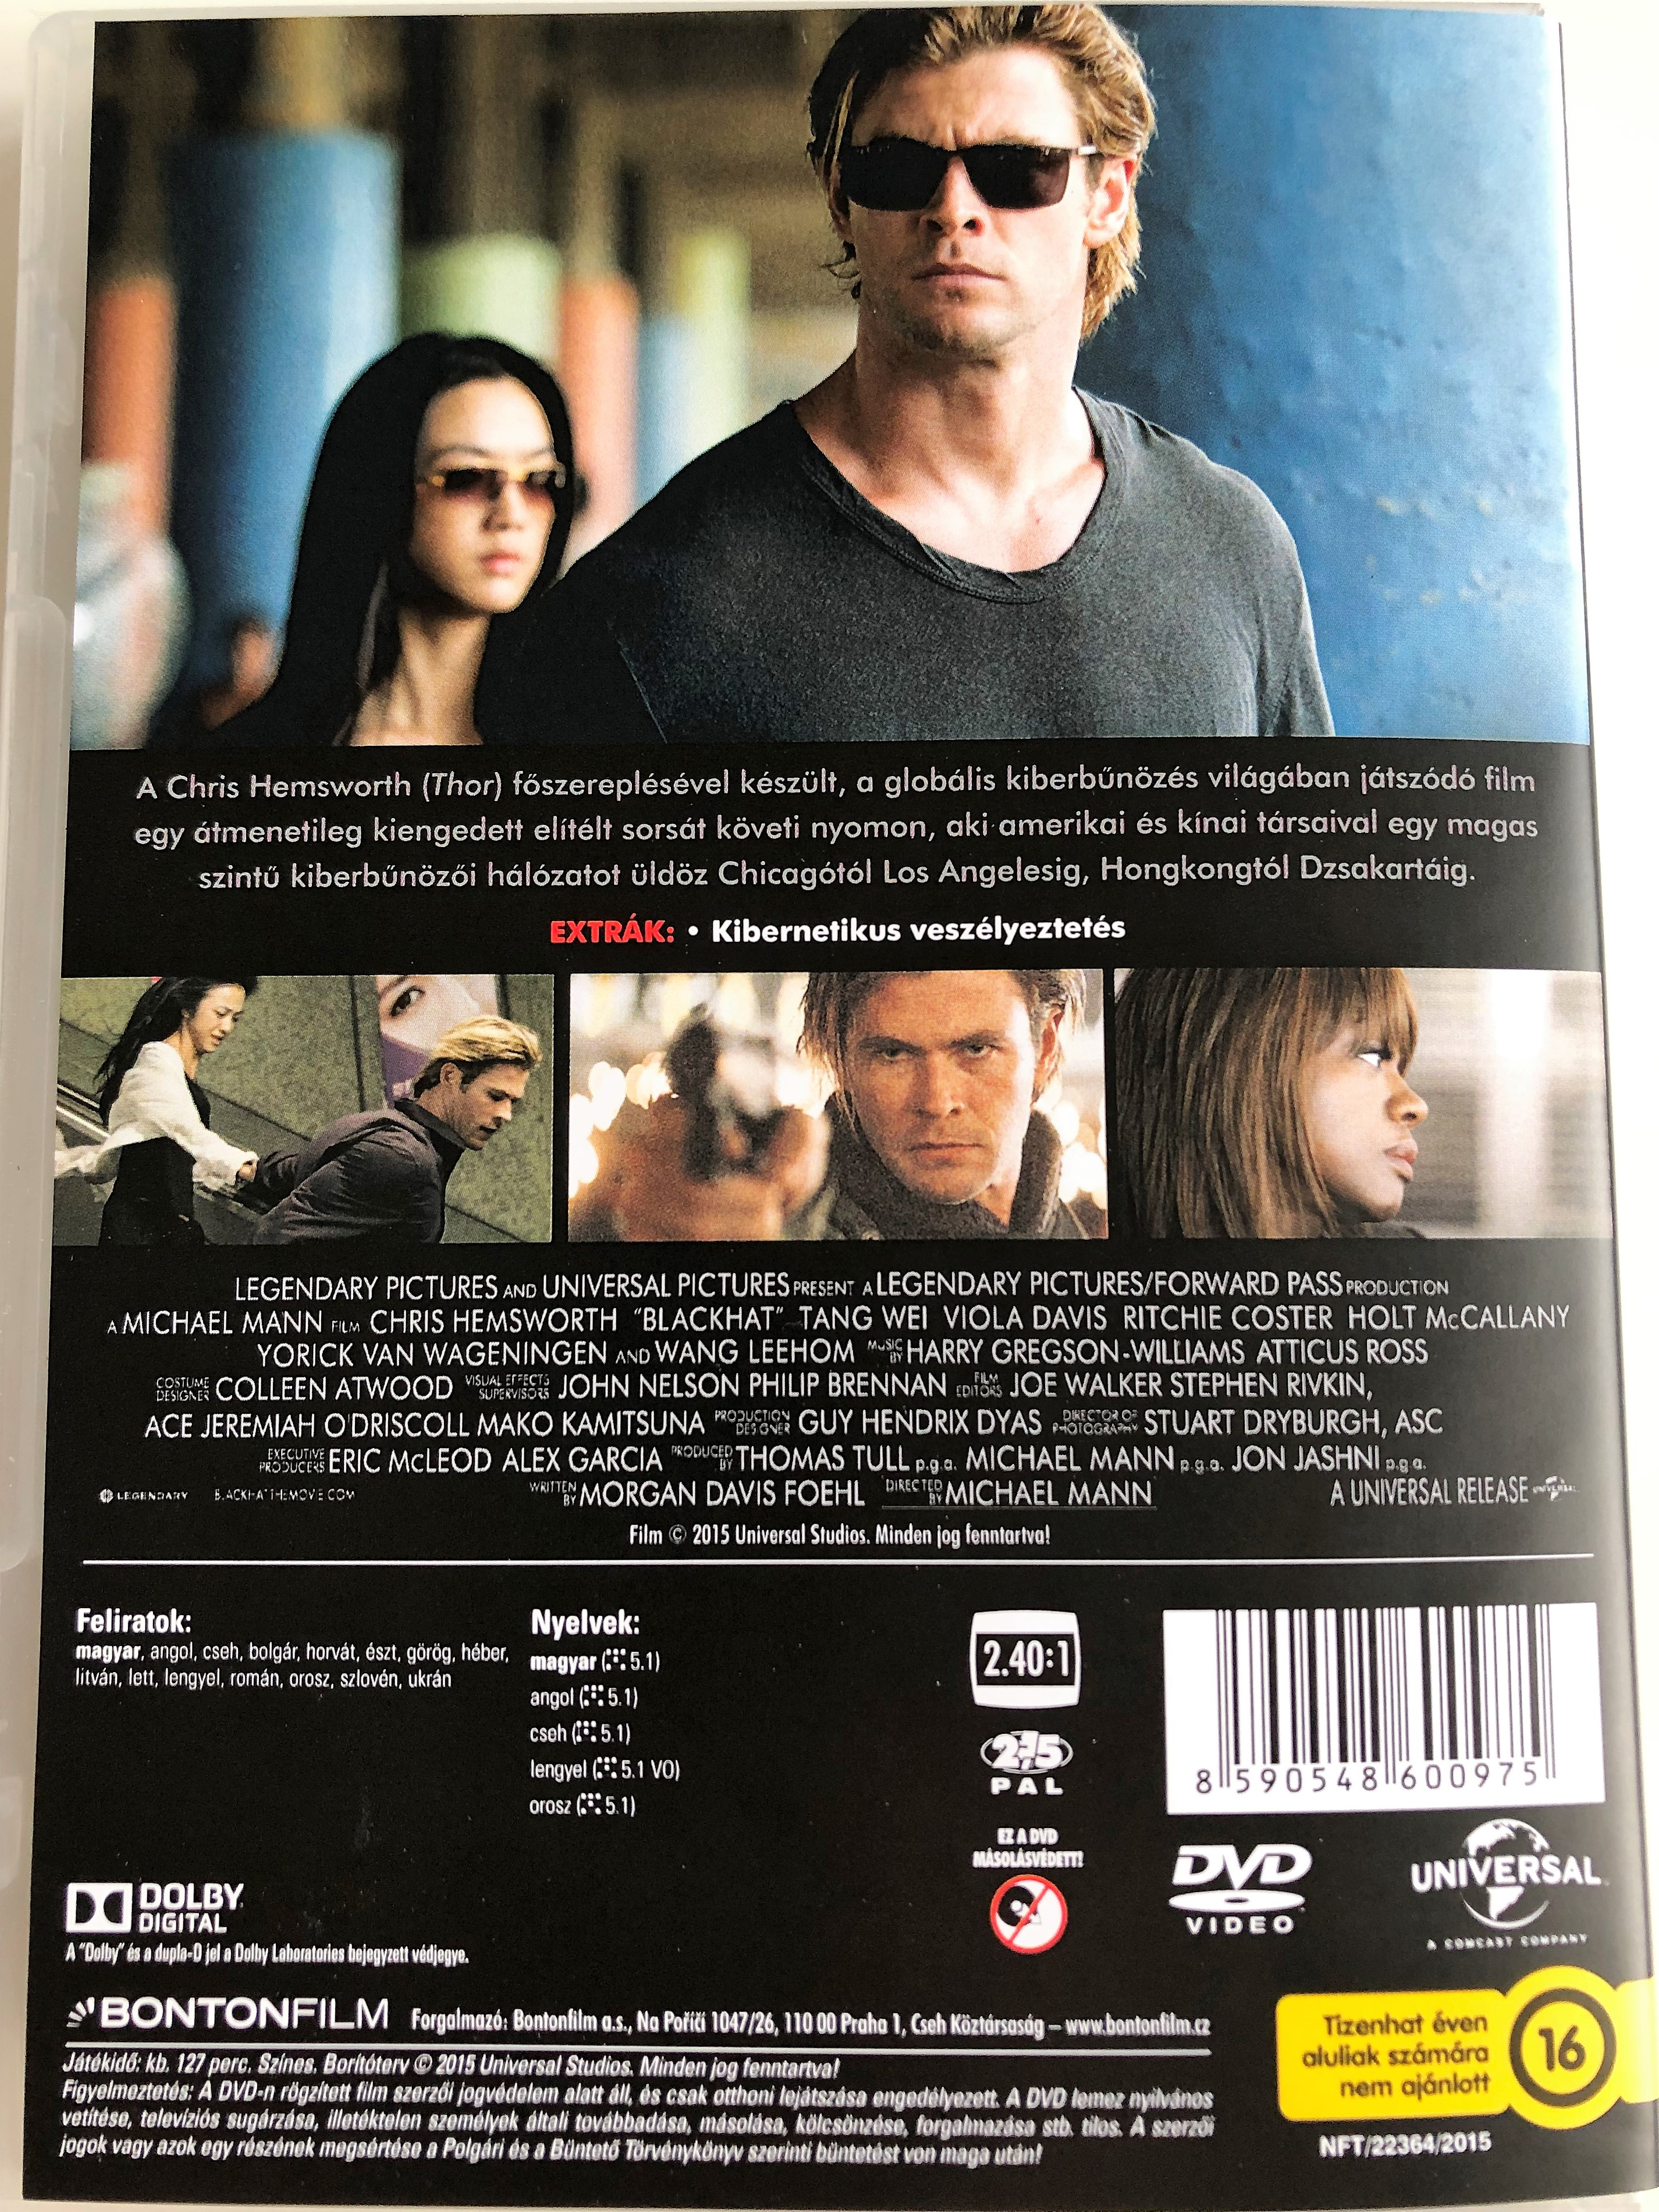 blackhat-dvd-2015-directed-by-michael-mann-starring-chris-hemsworth-tang-wei-viola-davis-ritchie-coster-holt-mccallany-yorick-van-wageningen-wang-leehom-2-.jpg